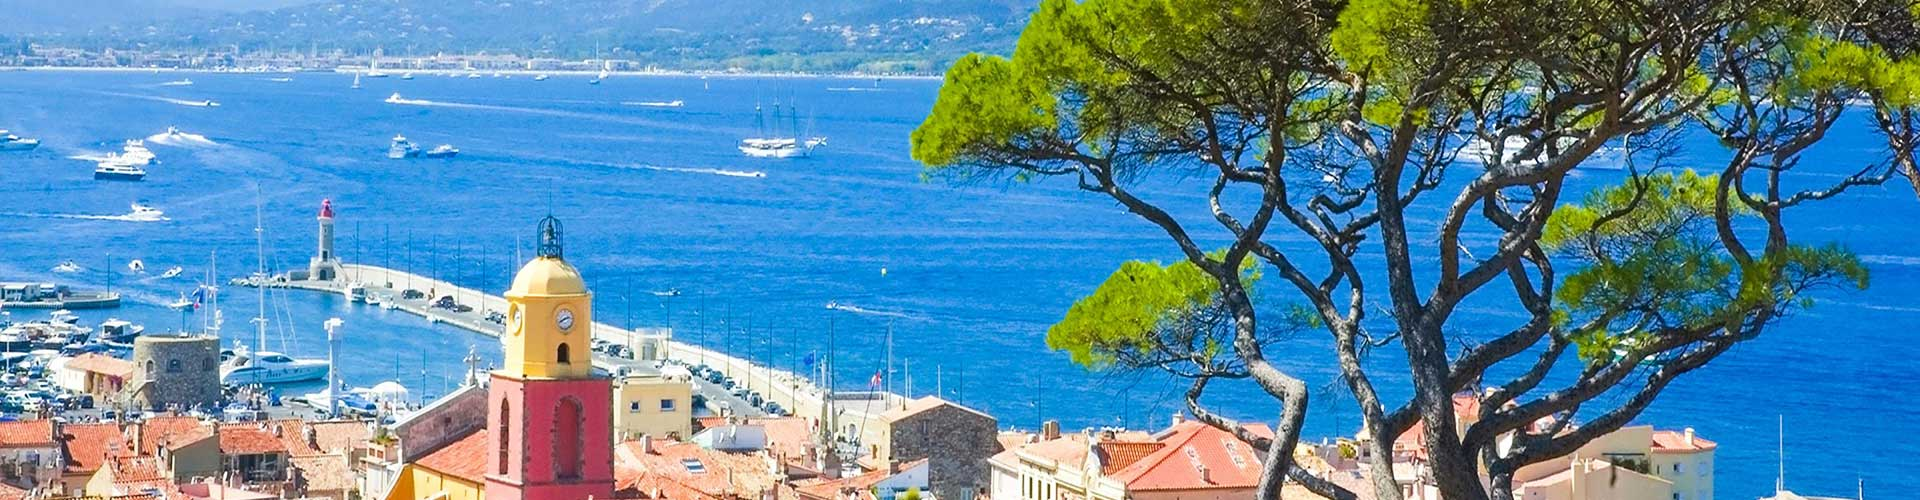 Лазурный Берег (Cote d'Azur)